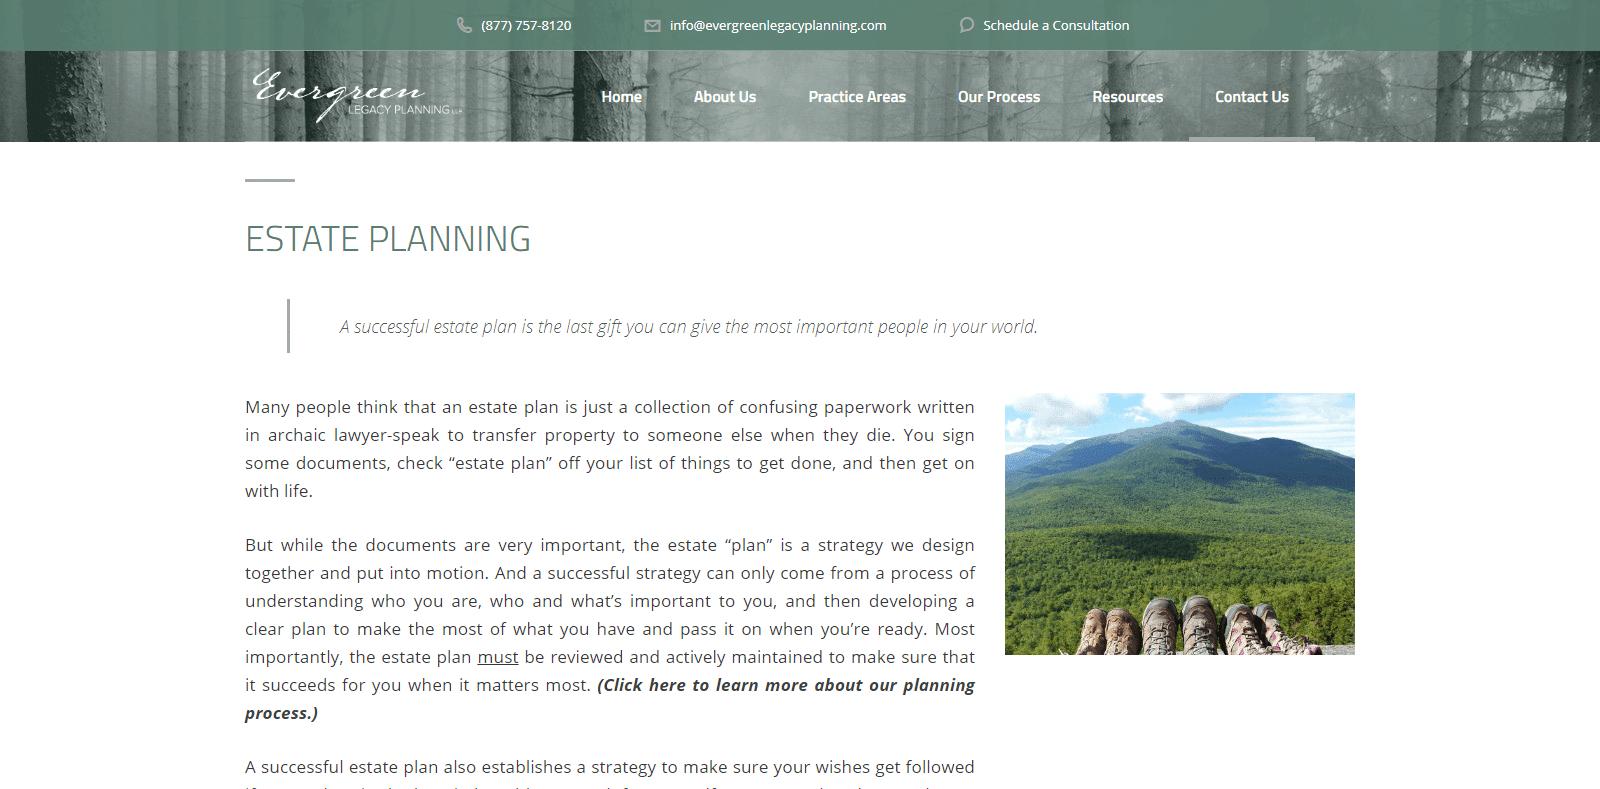 portfolio-evergreen-image6